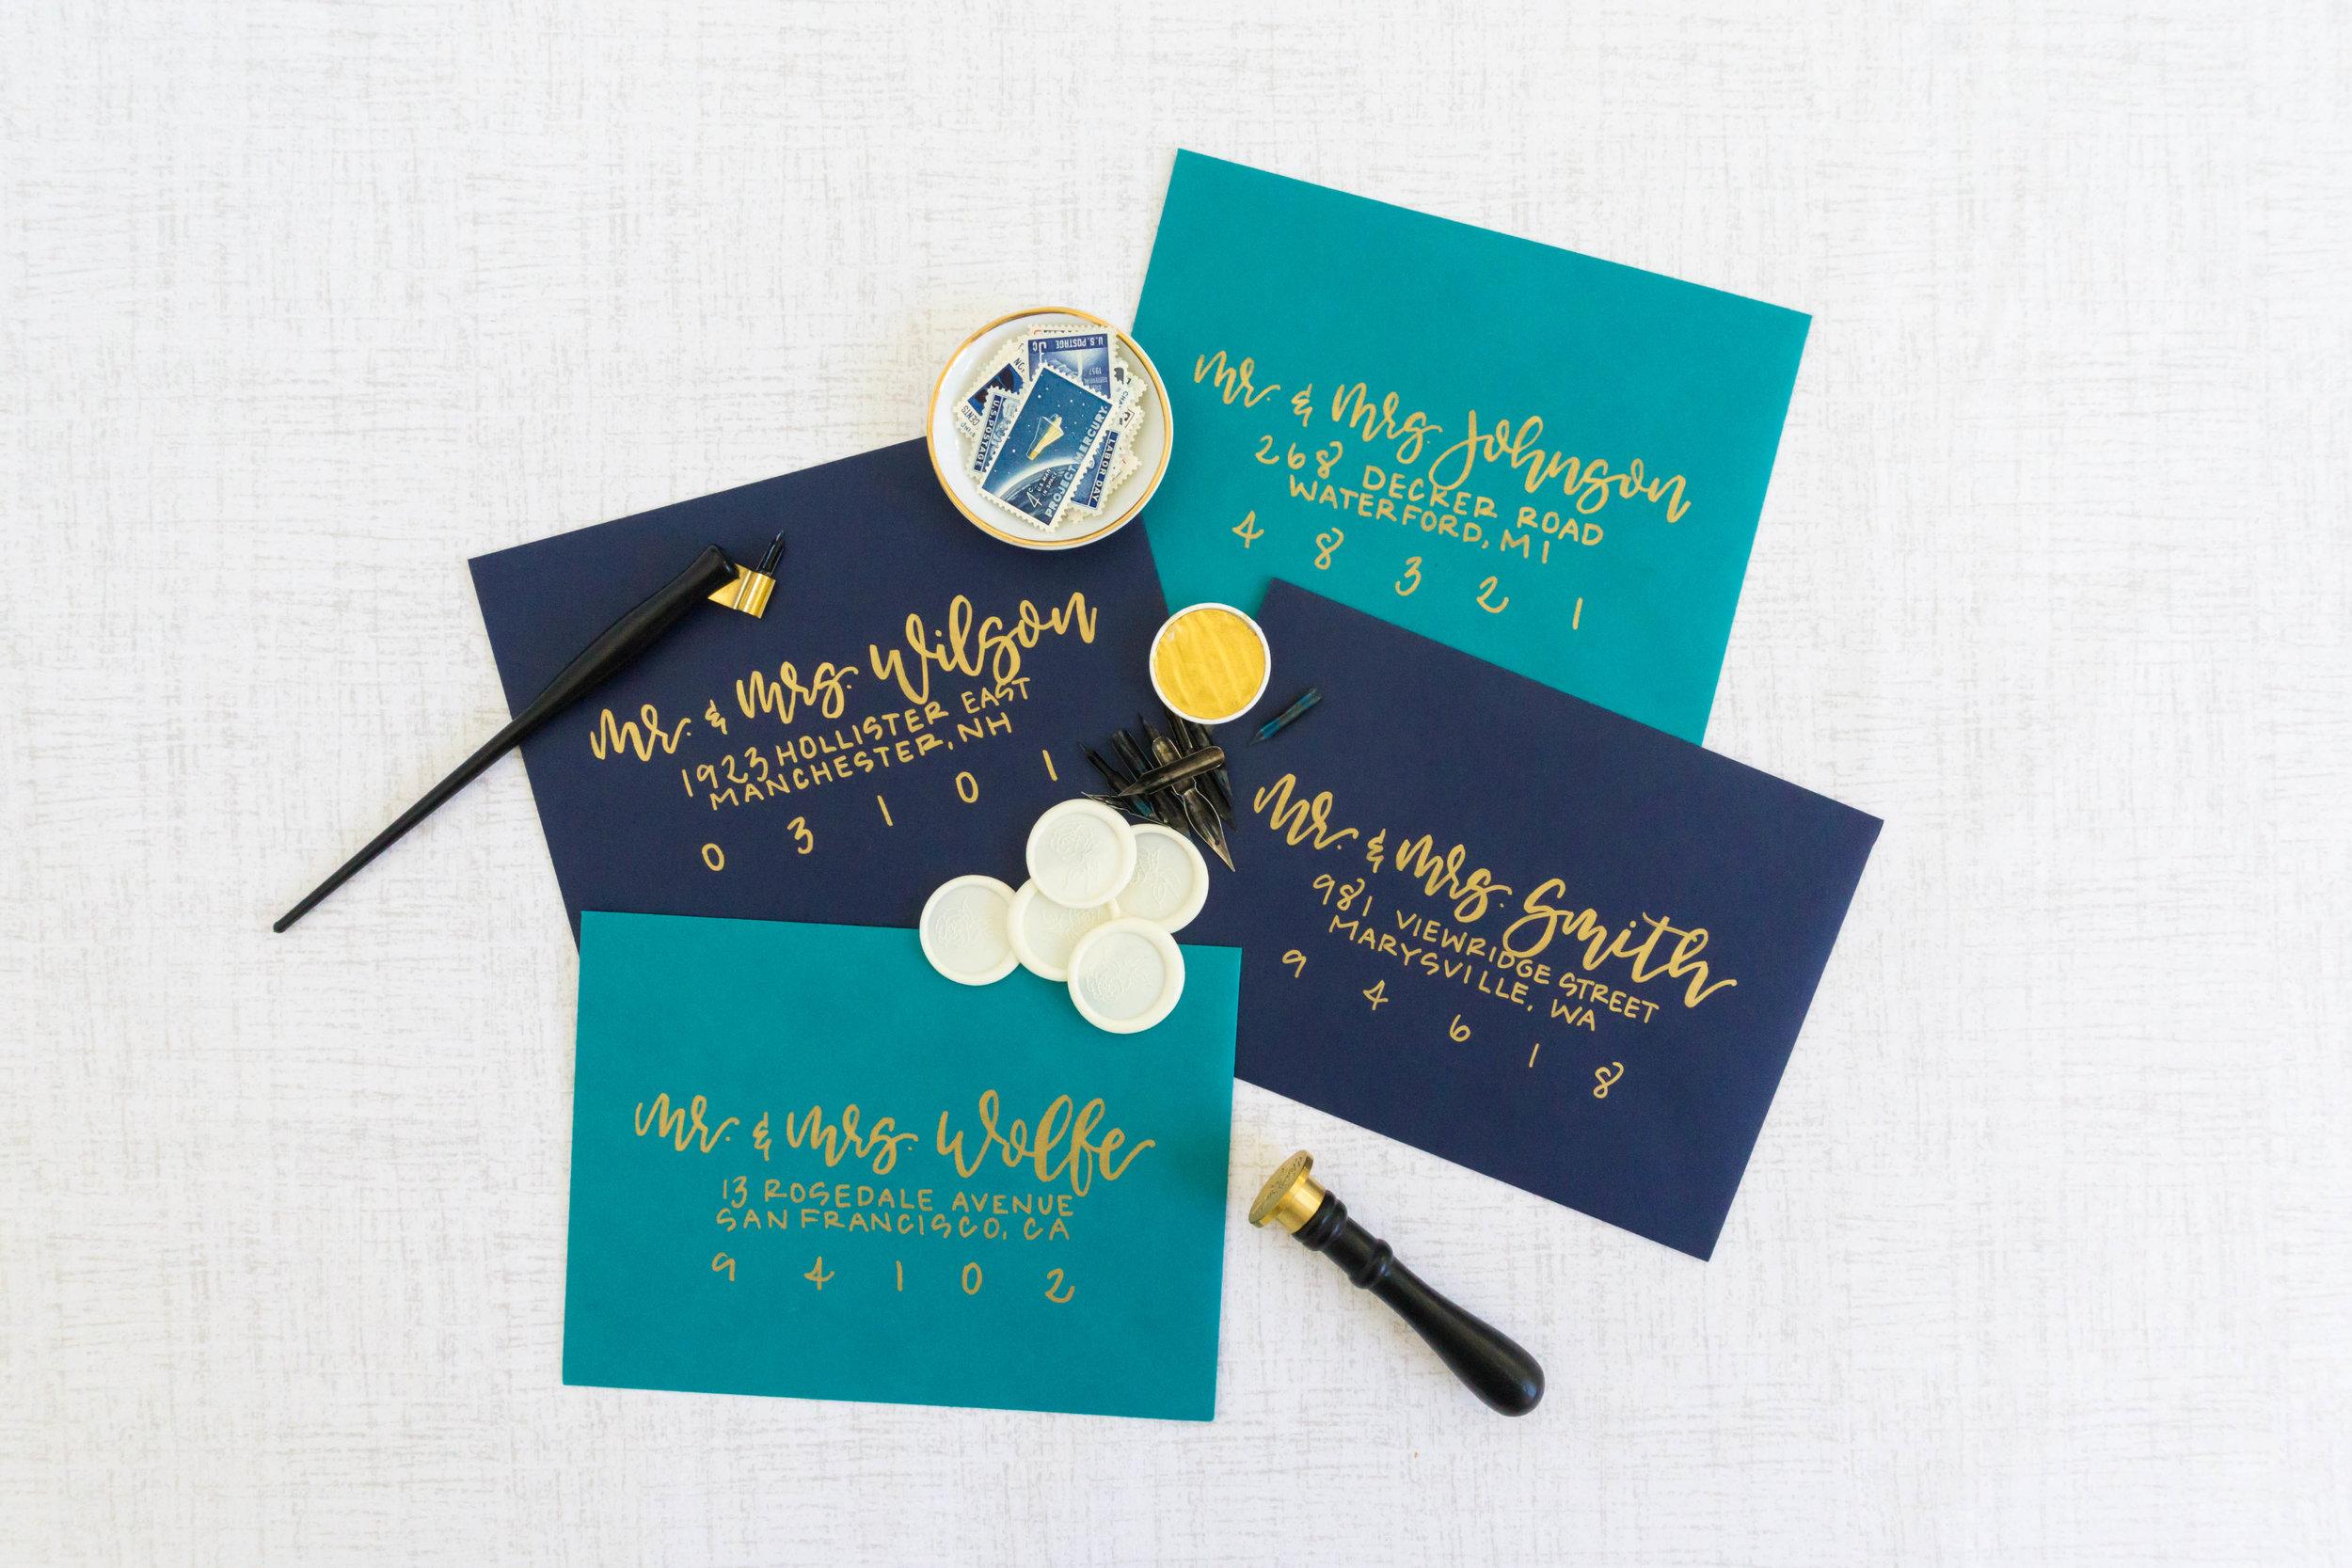 love-fern-design-studio-custom-wedding-invitations-for-the-modern-couple-modern-calligraphy-in-seattle-washington-custom-wedding-stationery20.jpg